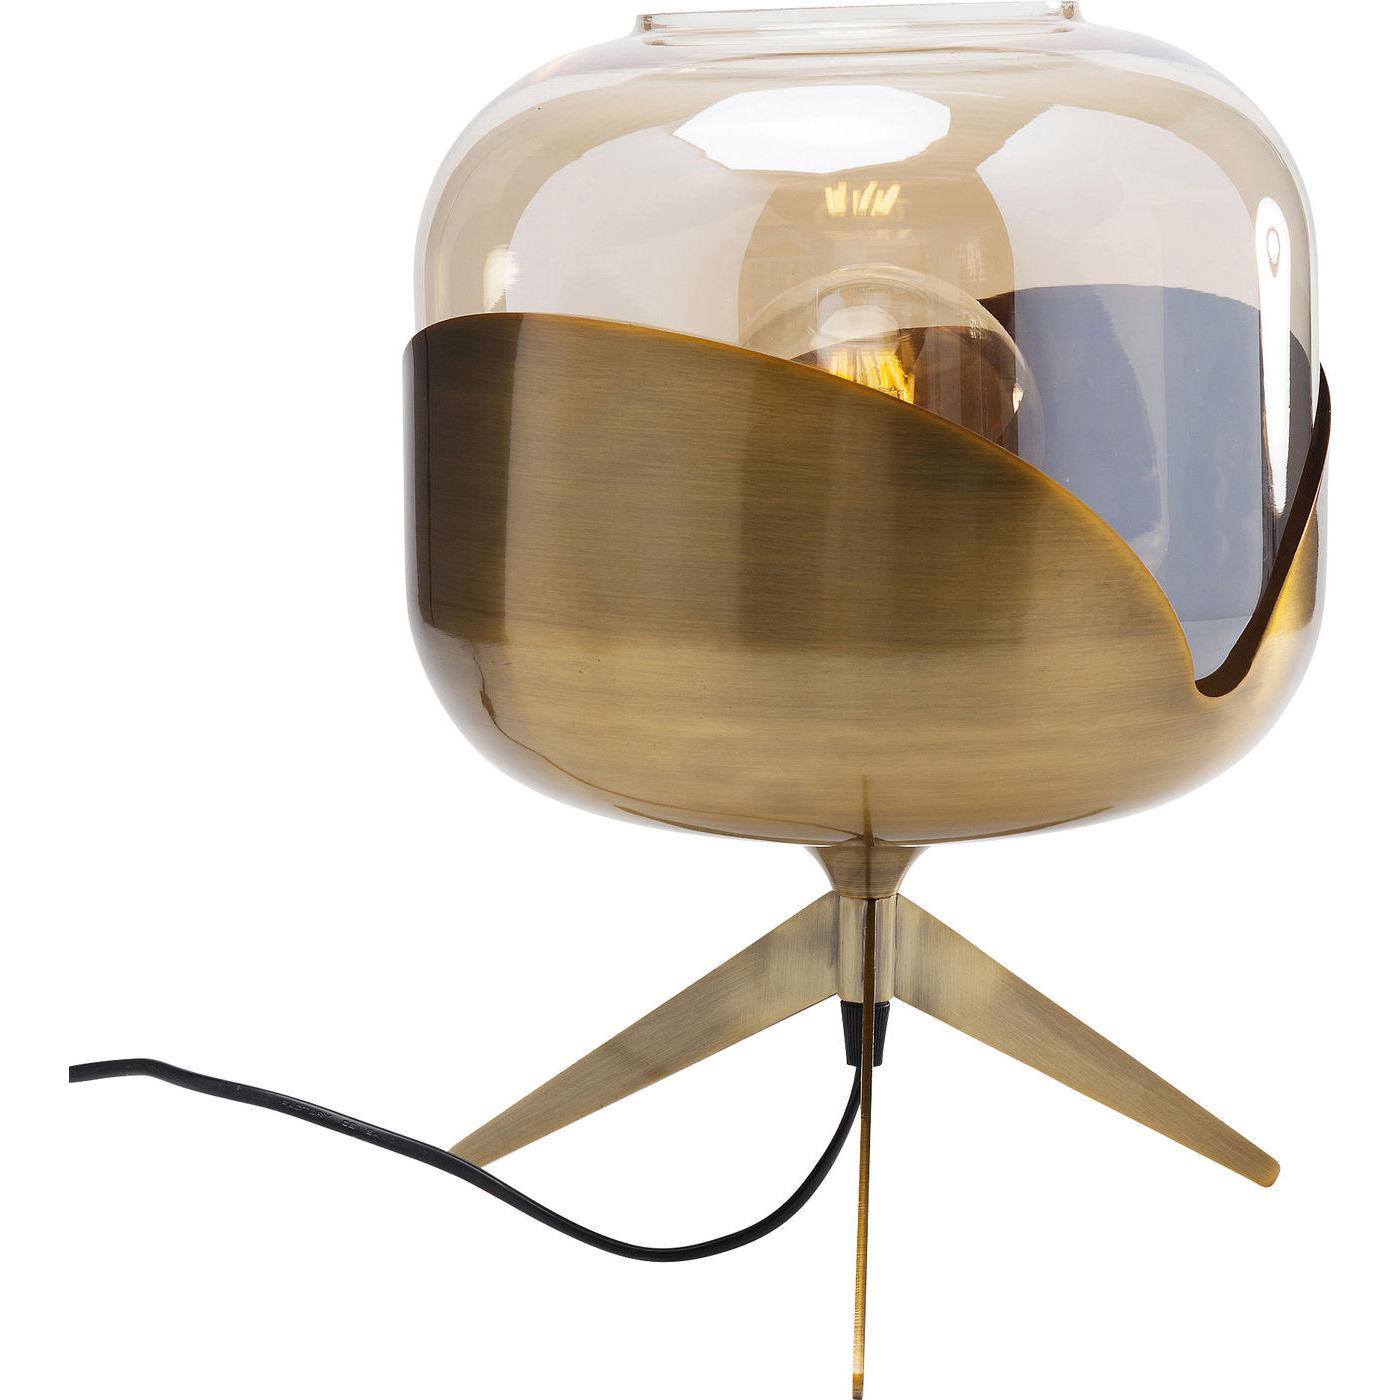 kare design – Kare design golden goblet ball bordlampe - farvet glas/messingbelagt stål fra boboonline.dk